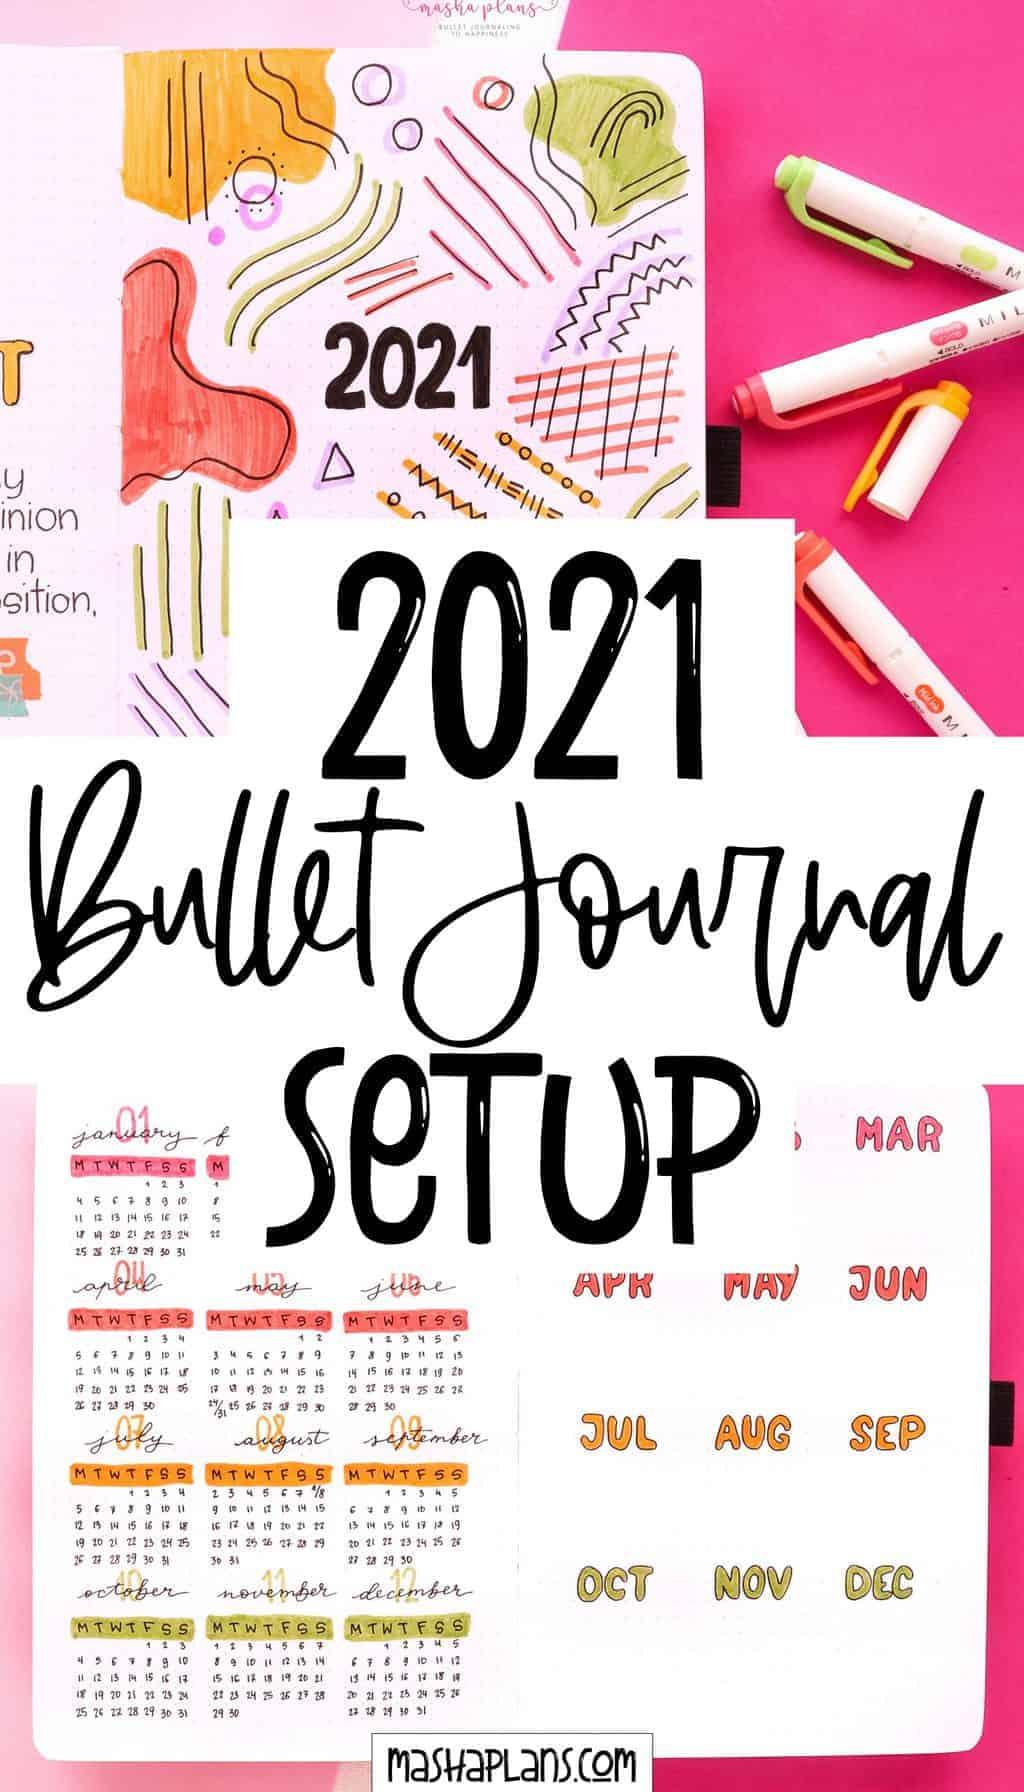 Plan With Me: My 2021 Bullet Journal Setup | Masha Plans